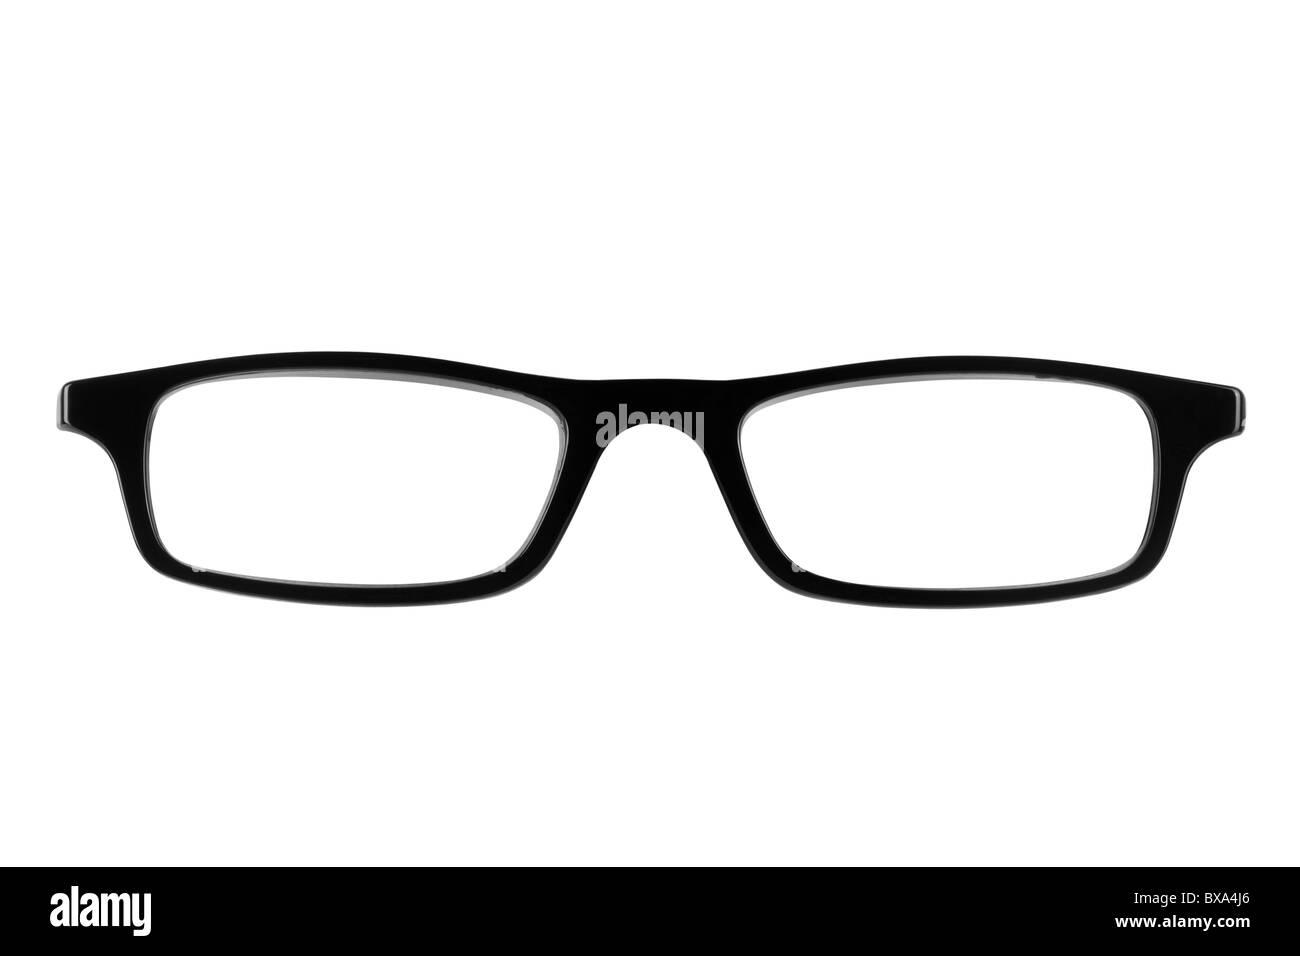 Photo of Black female spectacle frames - Stock Image